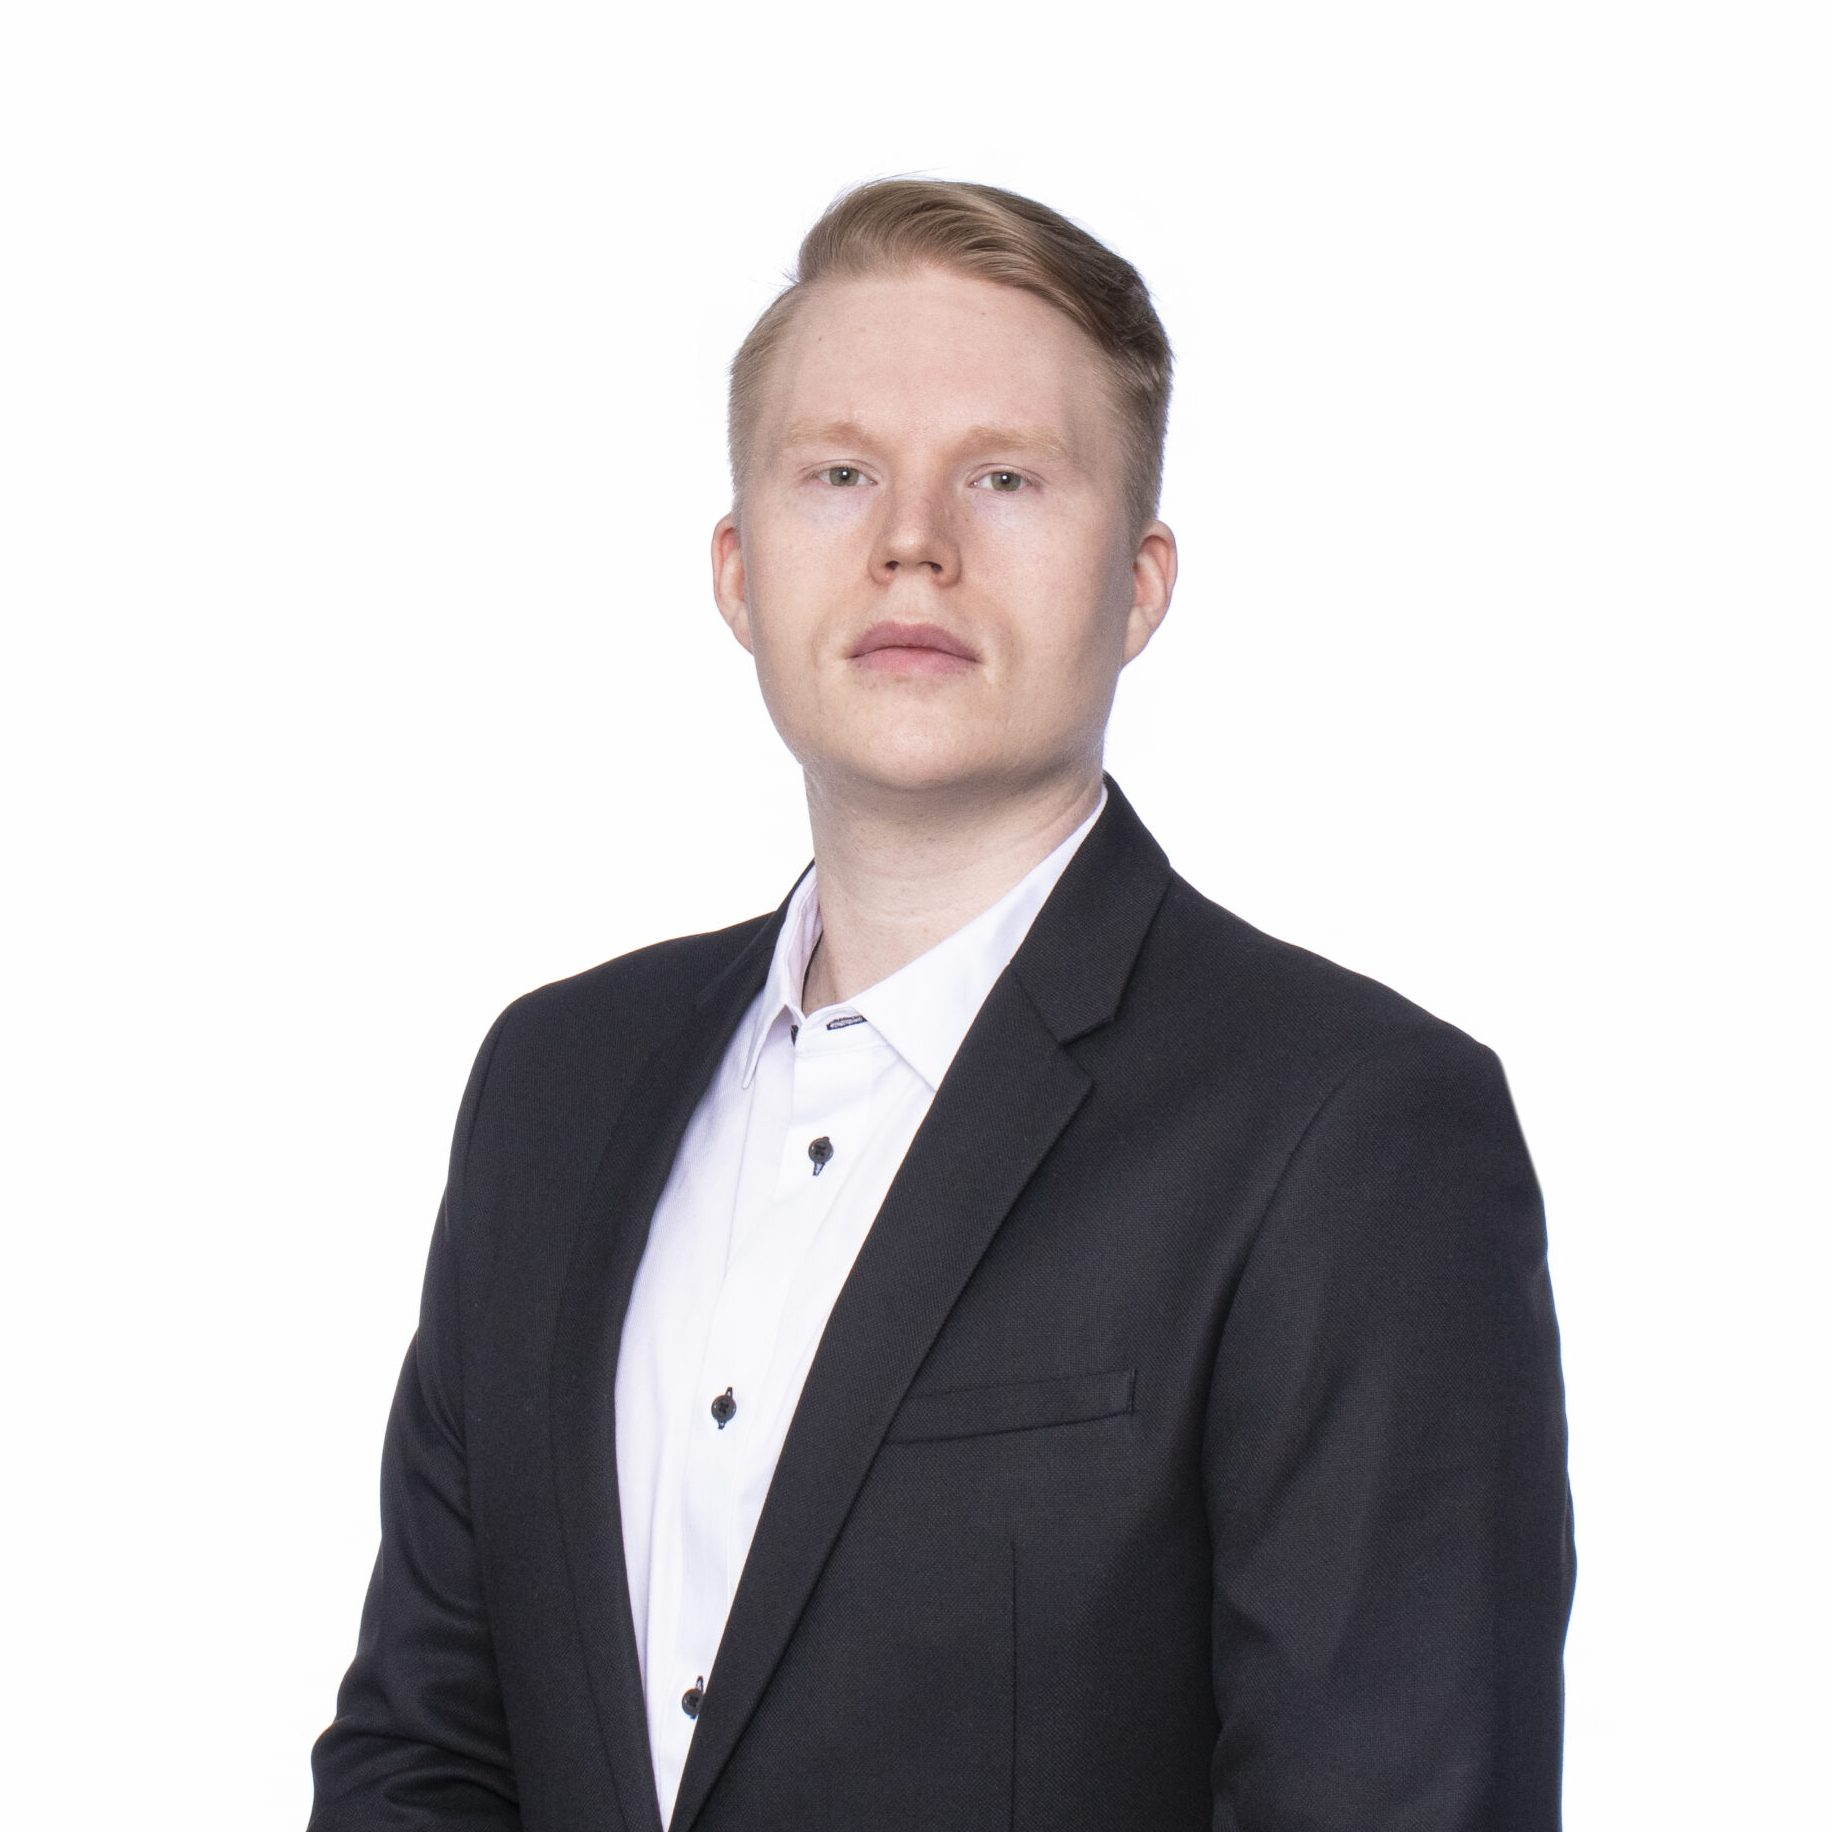 Alex Toiviainen